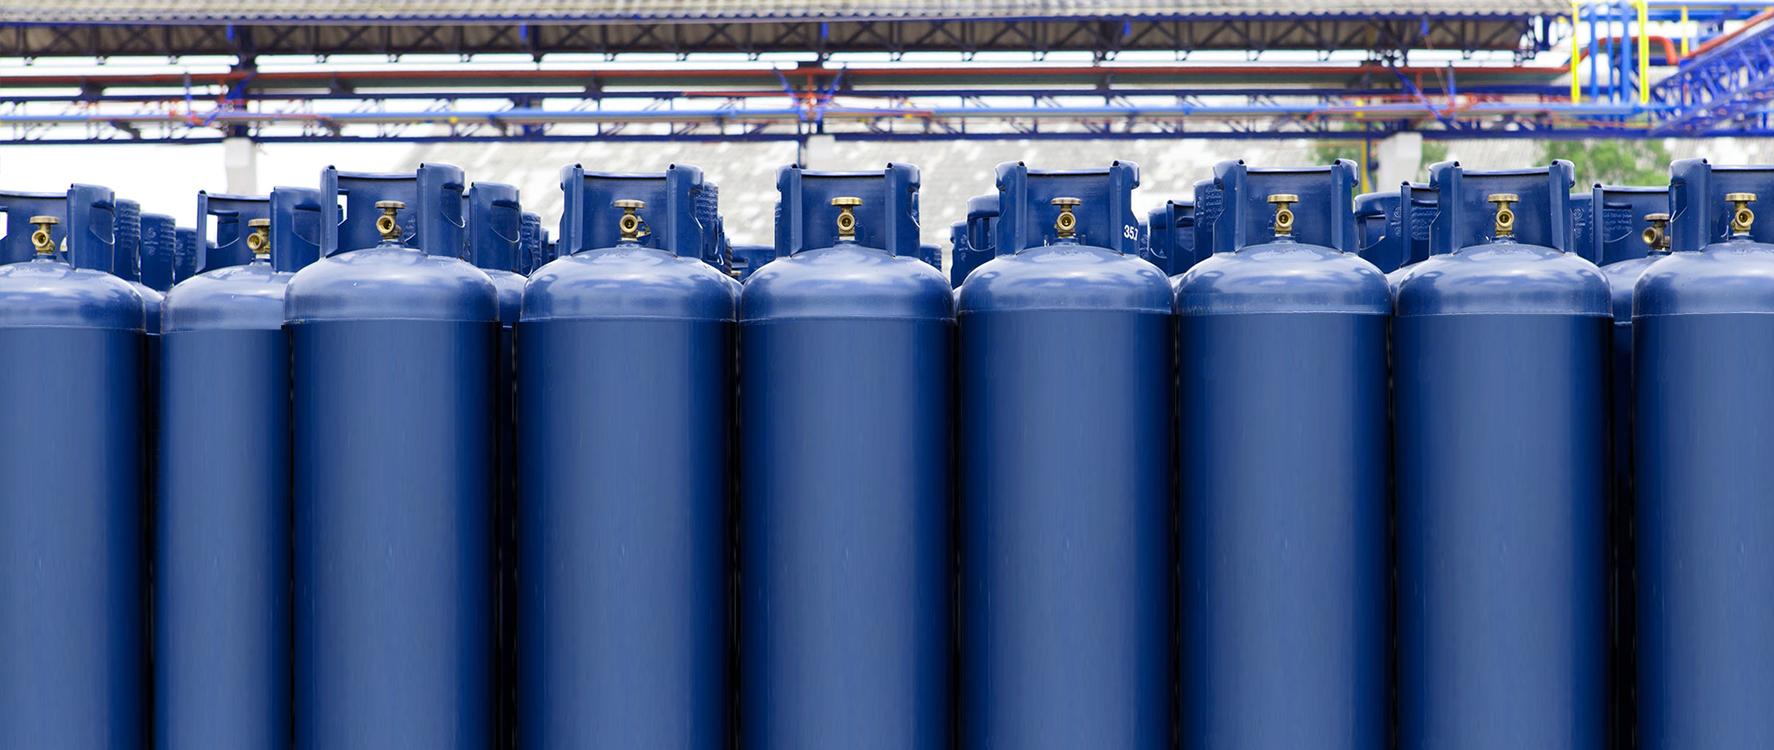 Vendita Bombole Gas Roma | BAIOCCO SIMONETTA